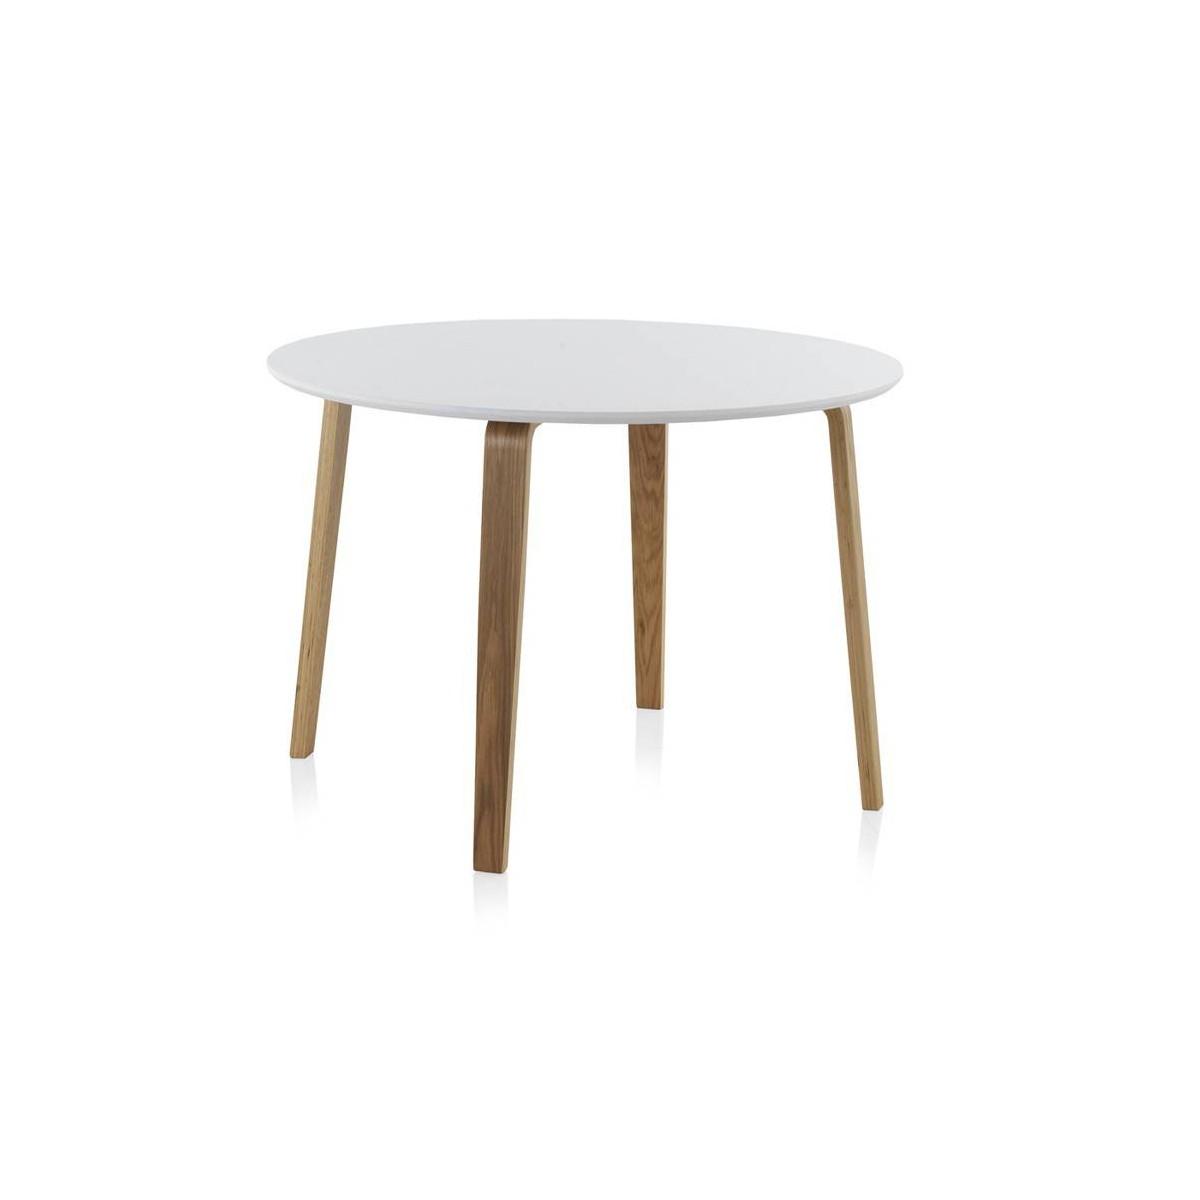 Mesa redonda comedor madera haya finland modelo 1 blanca - Mesa comedor redonda ...